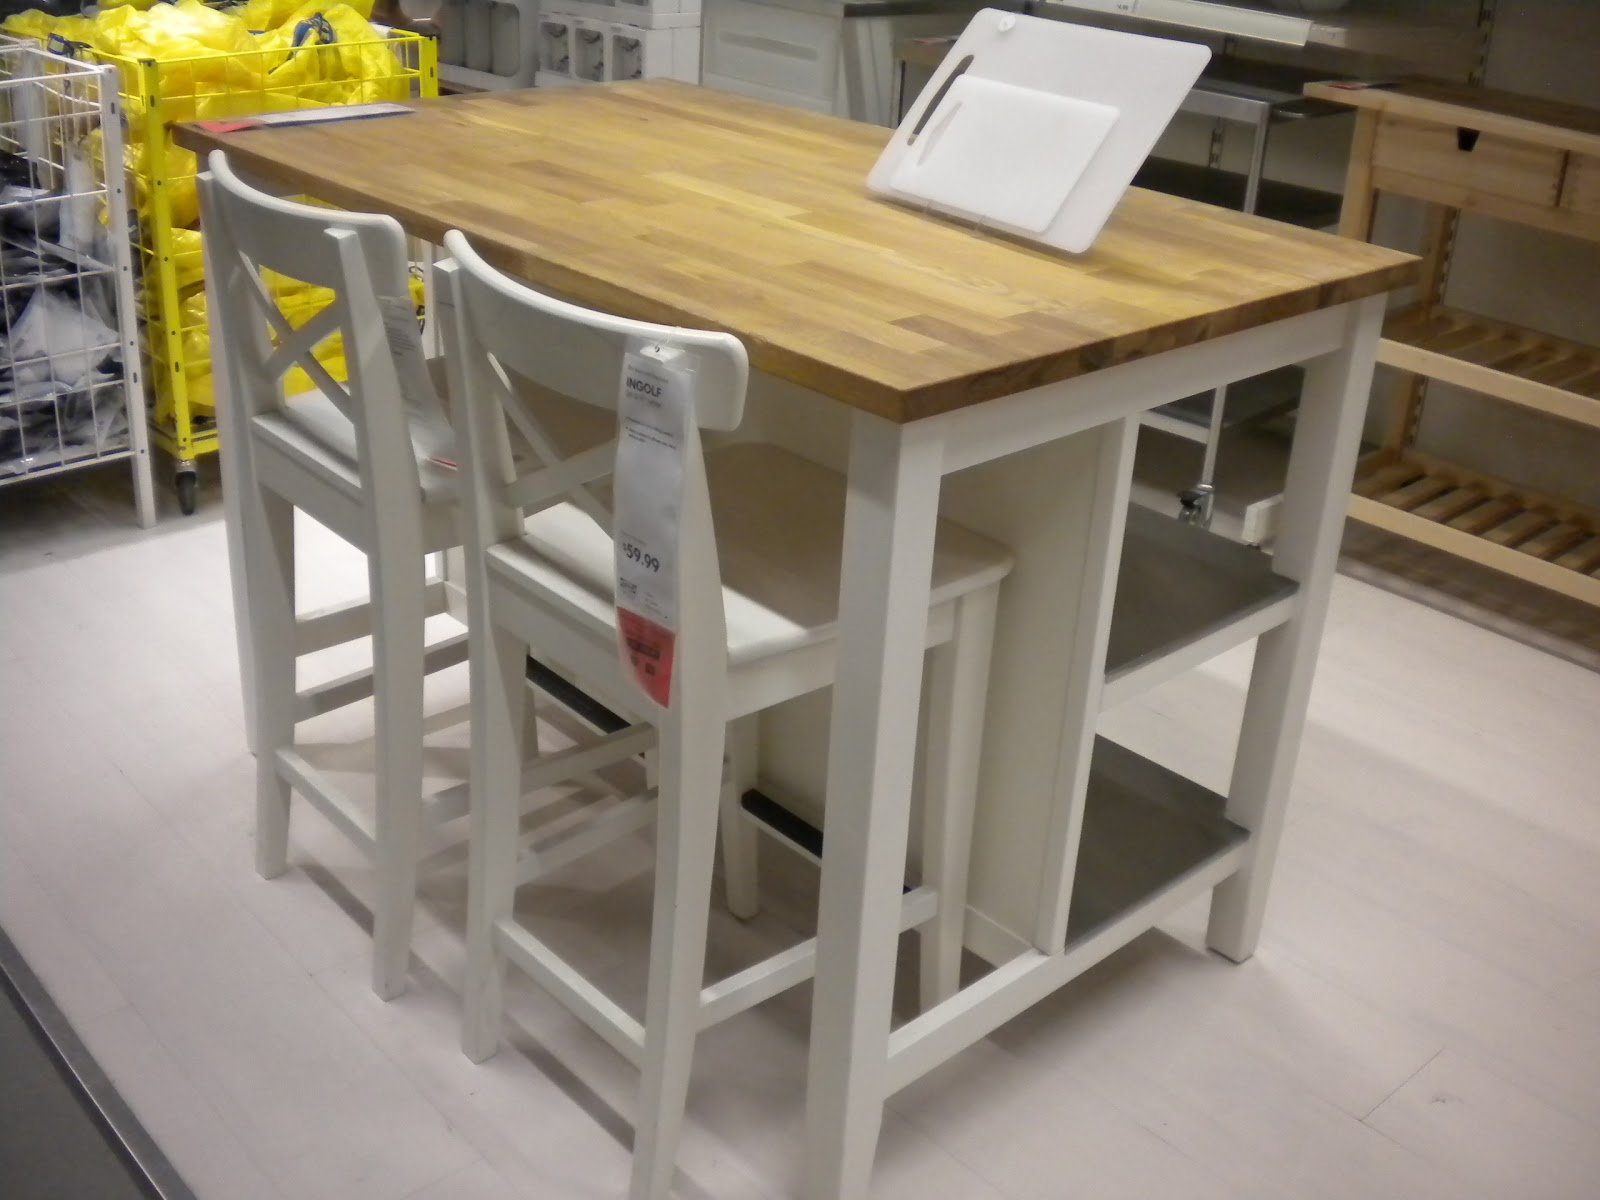 Ikea Stenstorp Kitchen Island Table  Nazarm.com